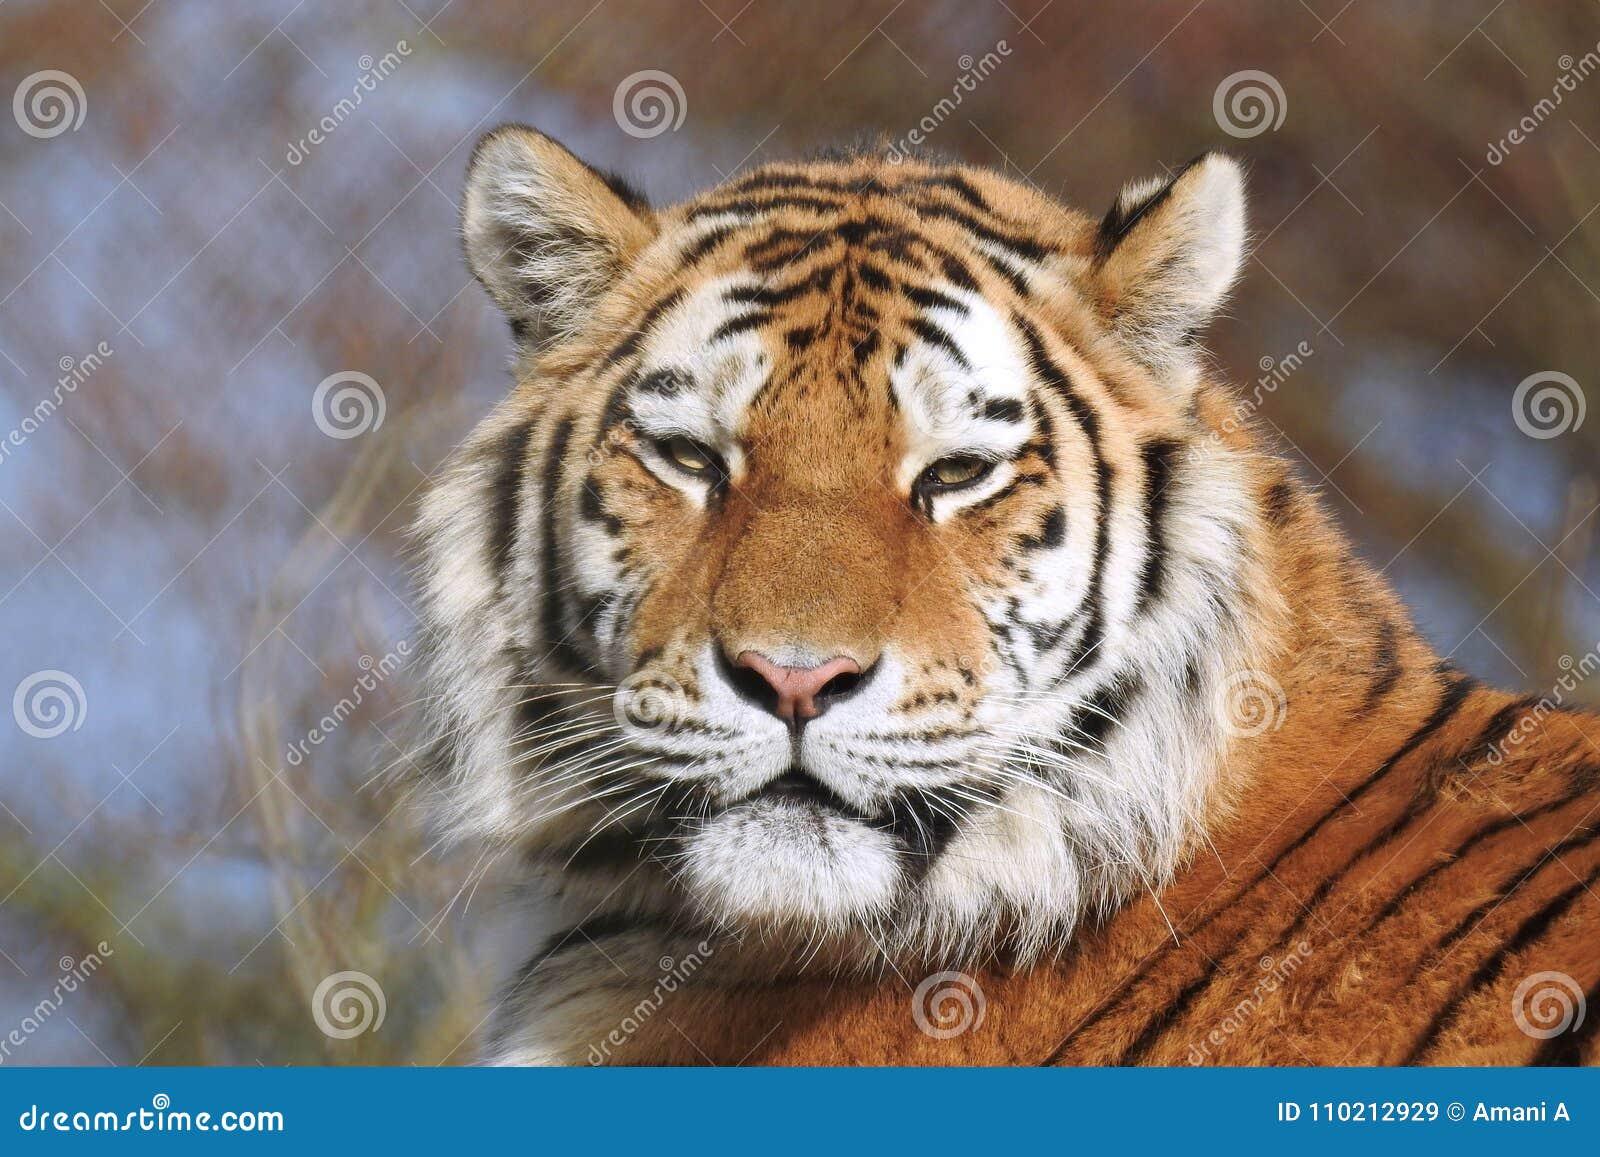 Siberisch Tiger Panthera Tigris Altaica Looking in lens